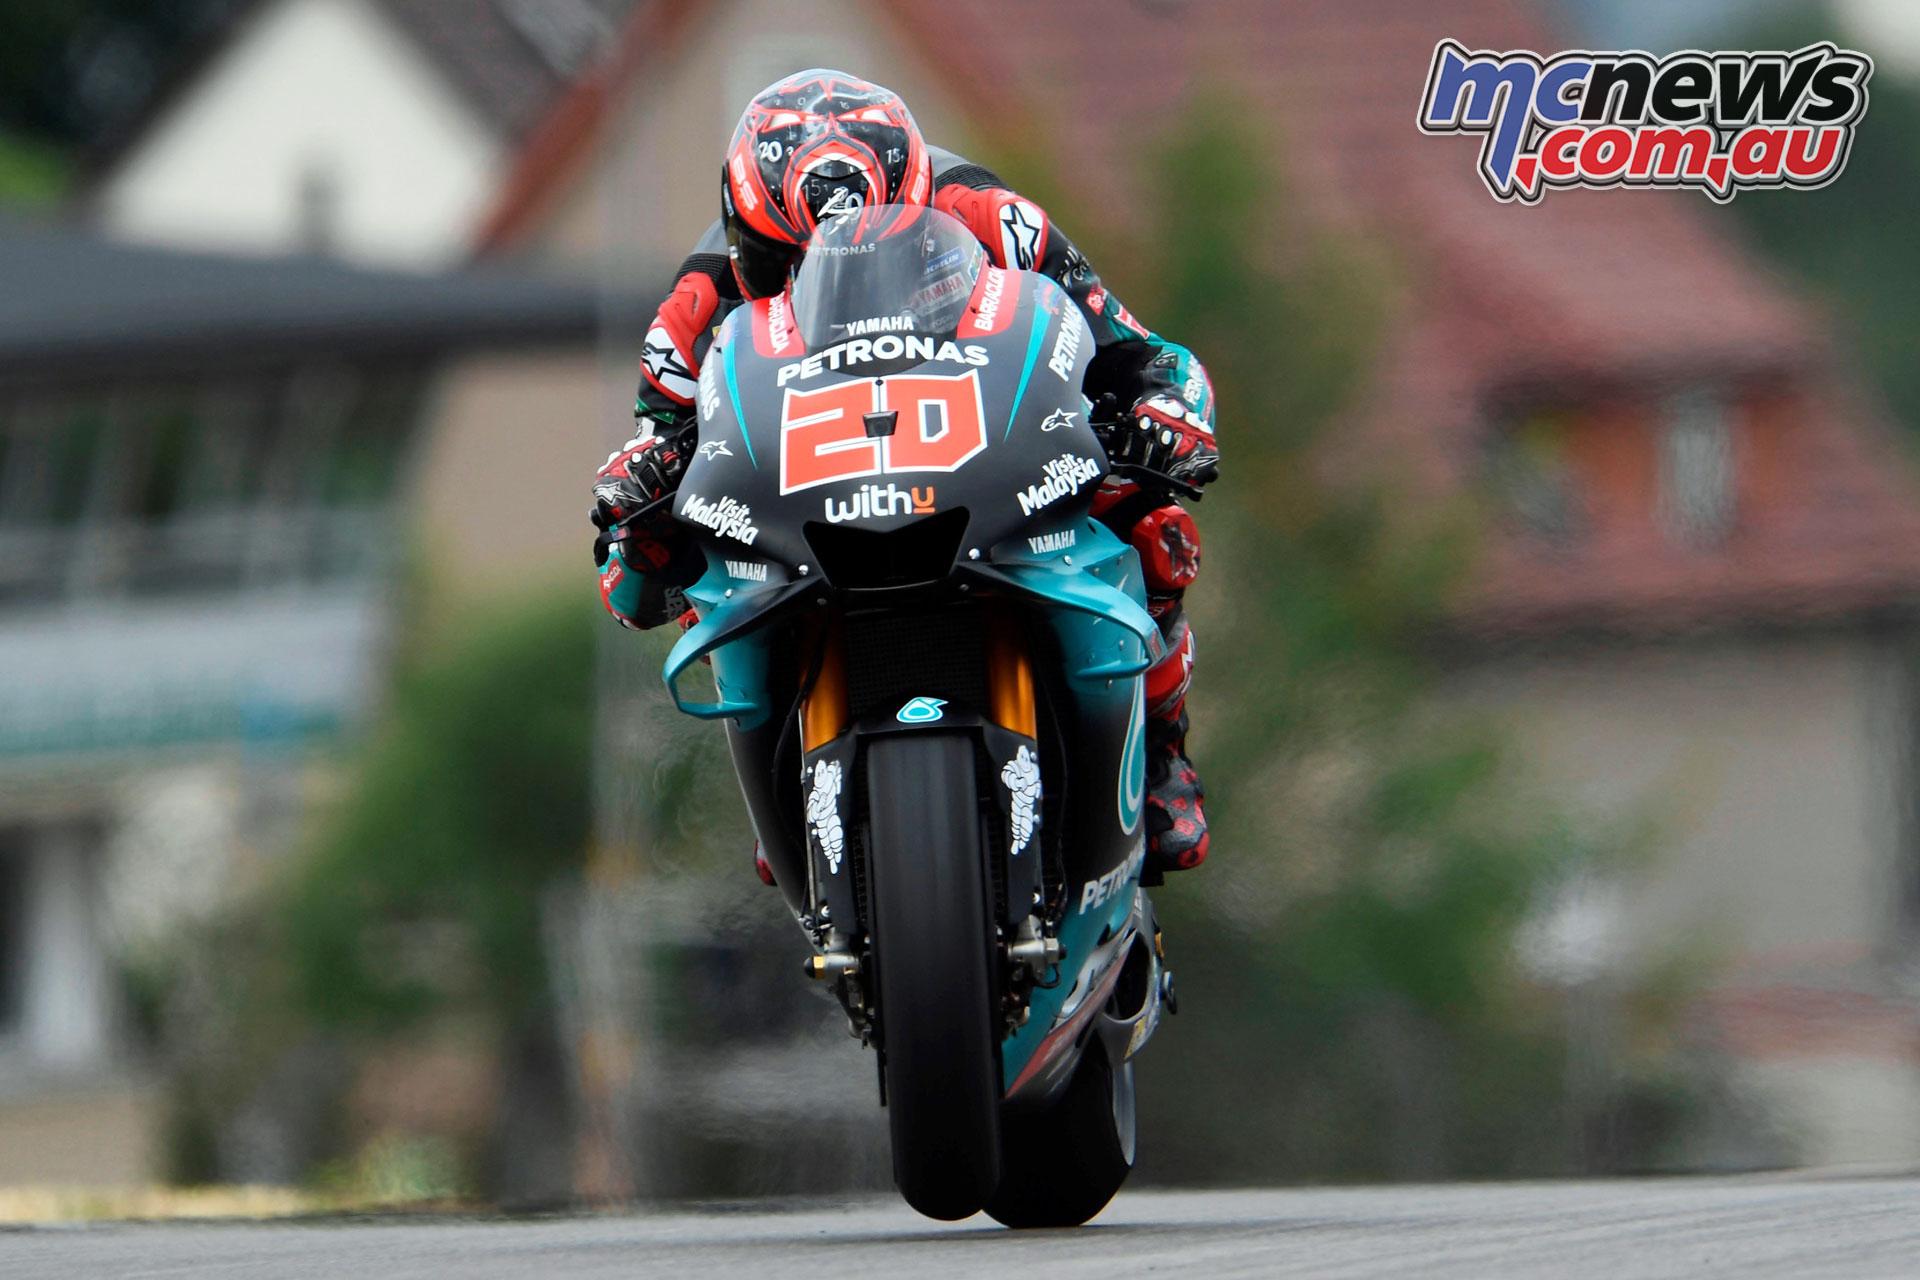 MotoGP Rnd Sachsenring Germany Fabio Quartararo